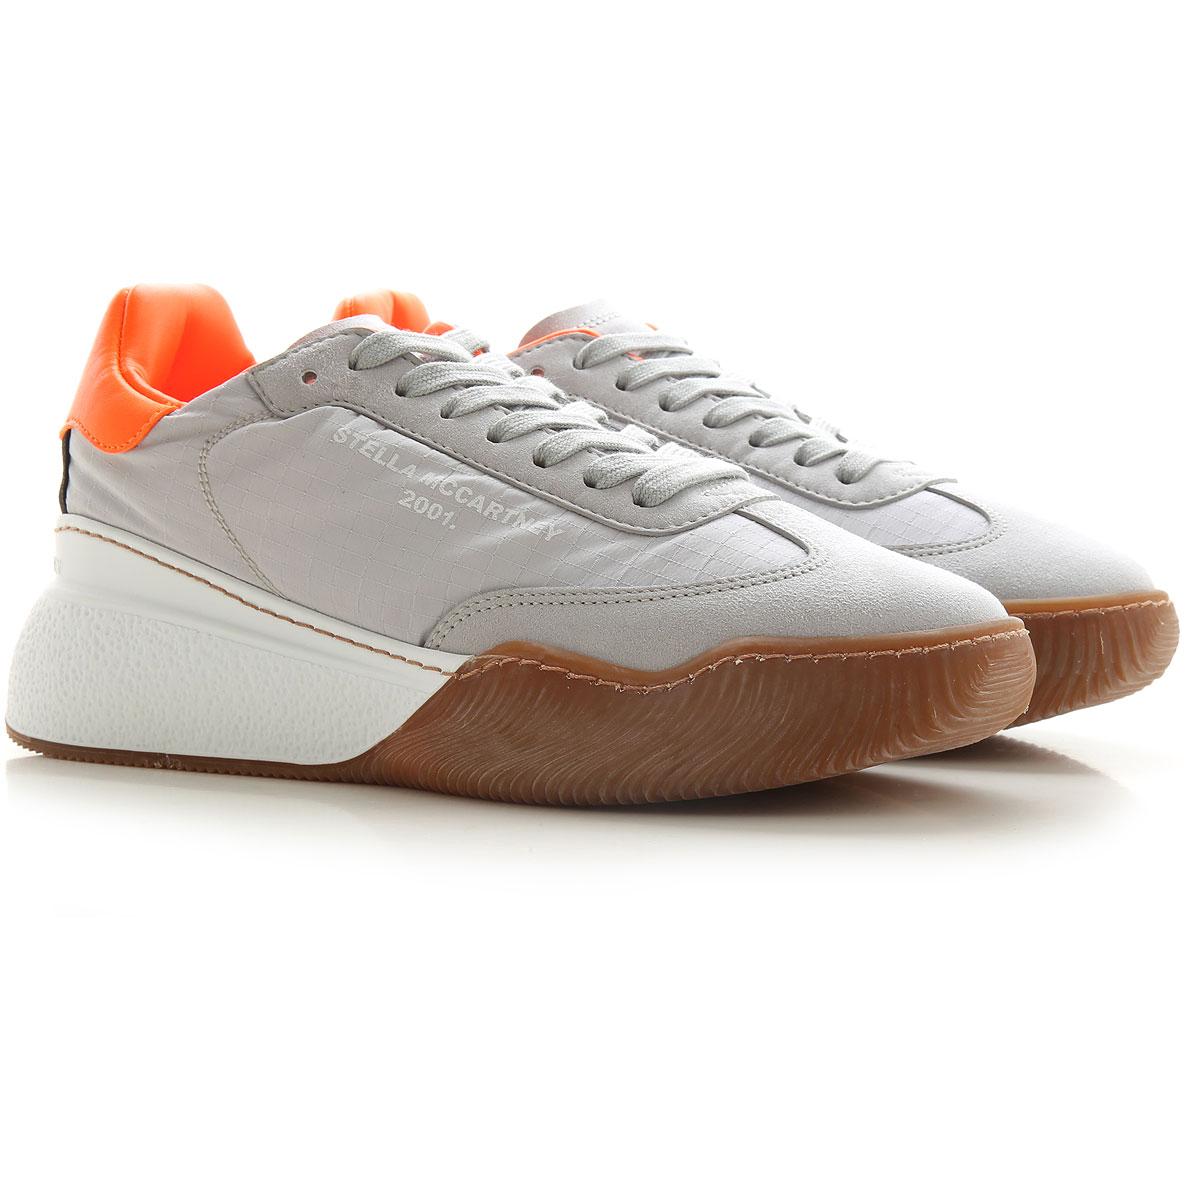 Stella McCartney Sneaker Femme Pas cher en Soldes, Gris perle, Nylon, 2019, 35 36 38 39